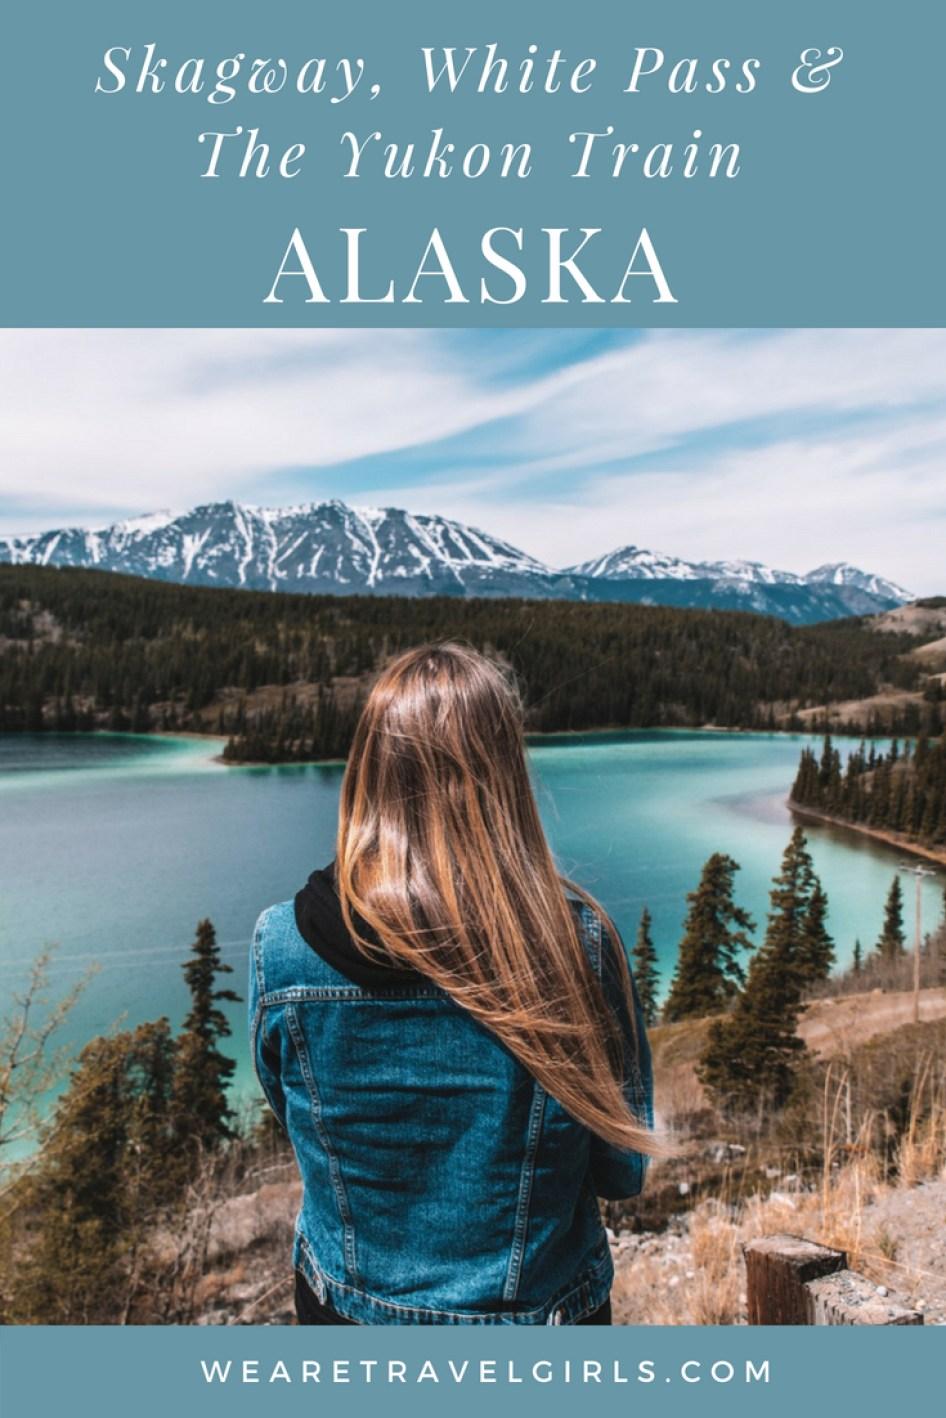 Skagway, White Pass & The Yukon Train, Alaska